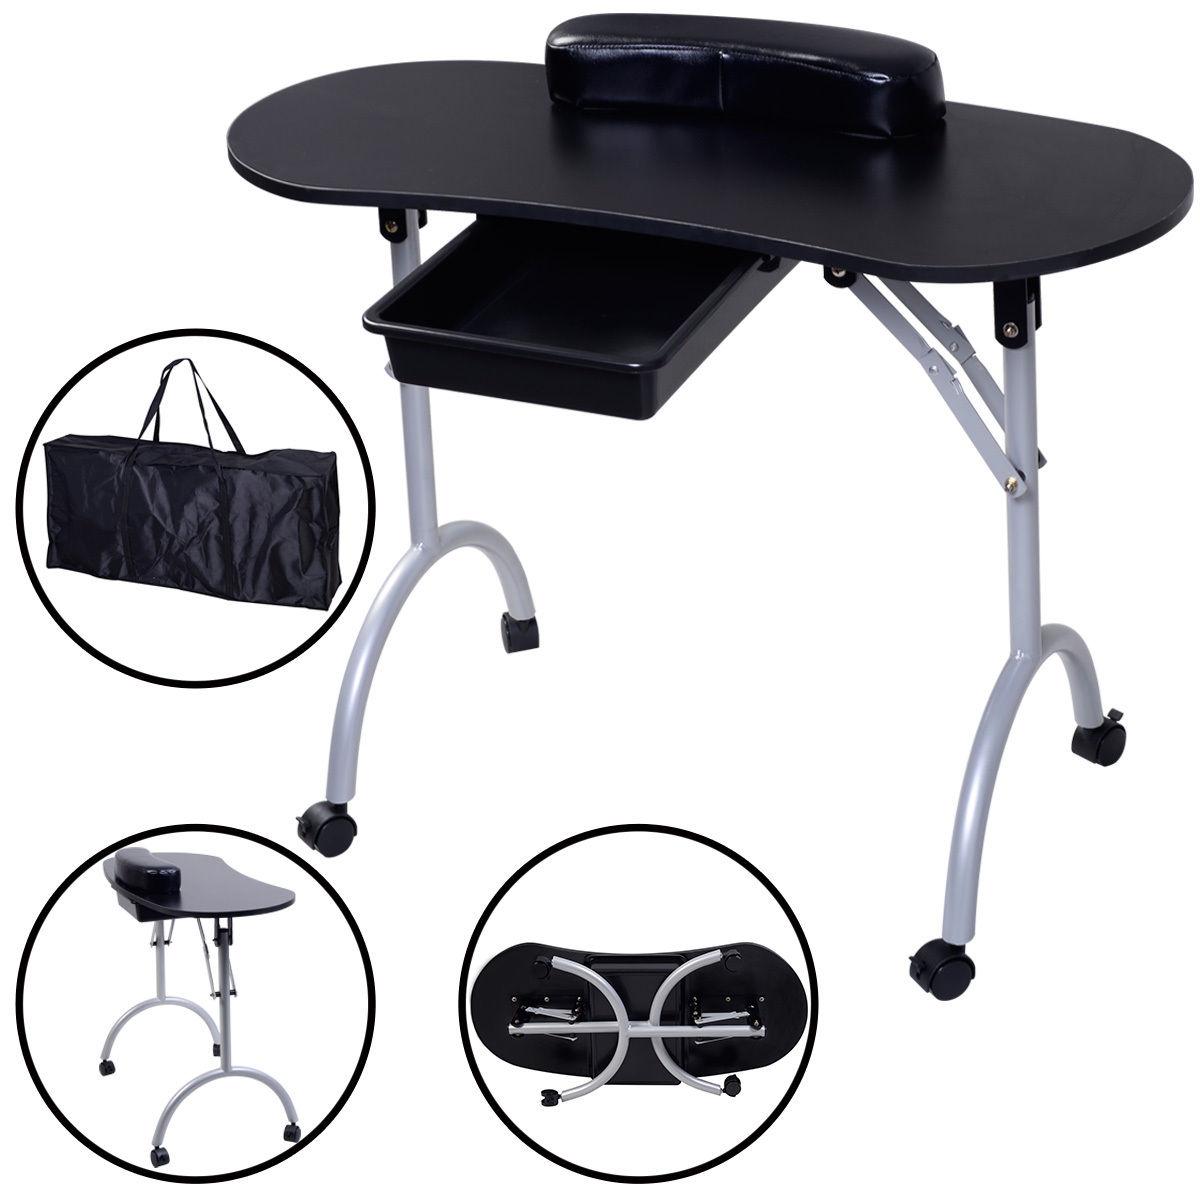 Portable Manicure Nail Table Station Desk Spa Beauty Salon Equipment 2 color-Black